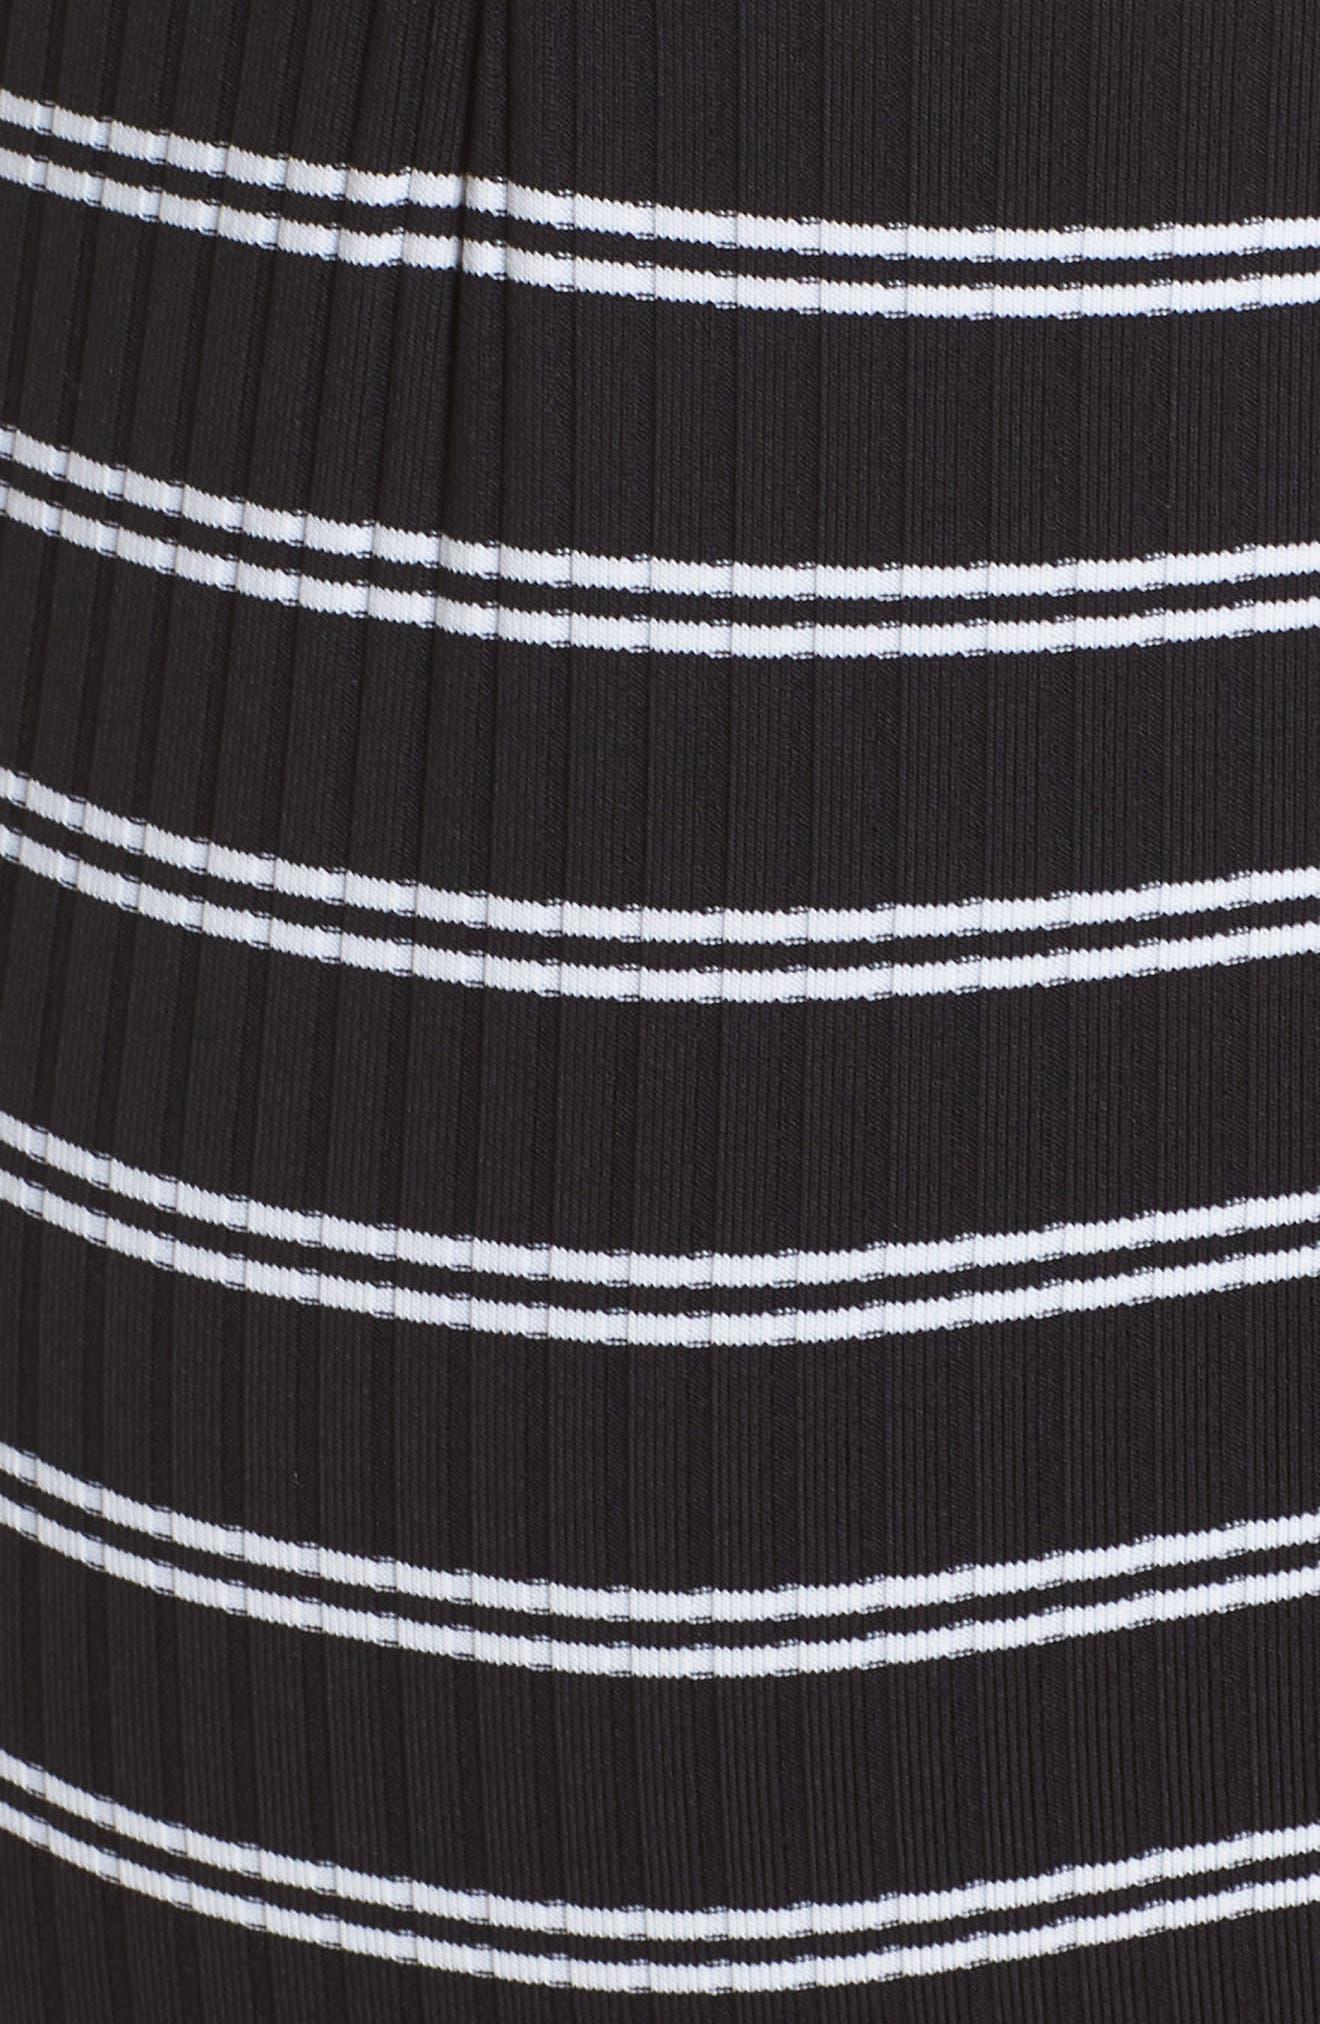 Inka Stripe Lace-Up One-Piece Swimsuit,                             Alternate thumbnail 5, color,                             Black